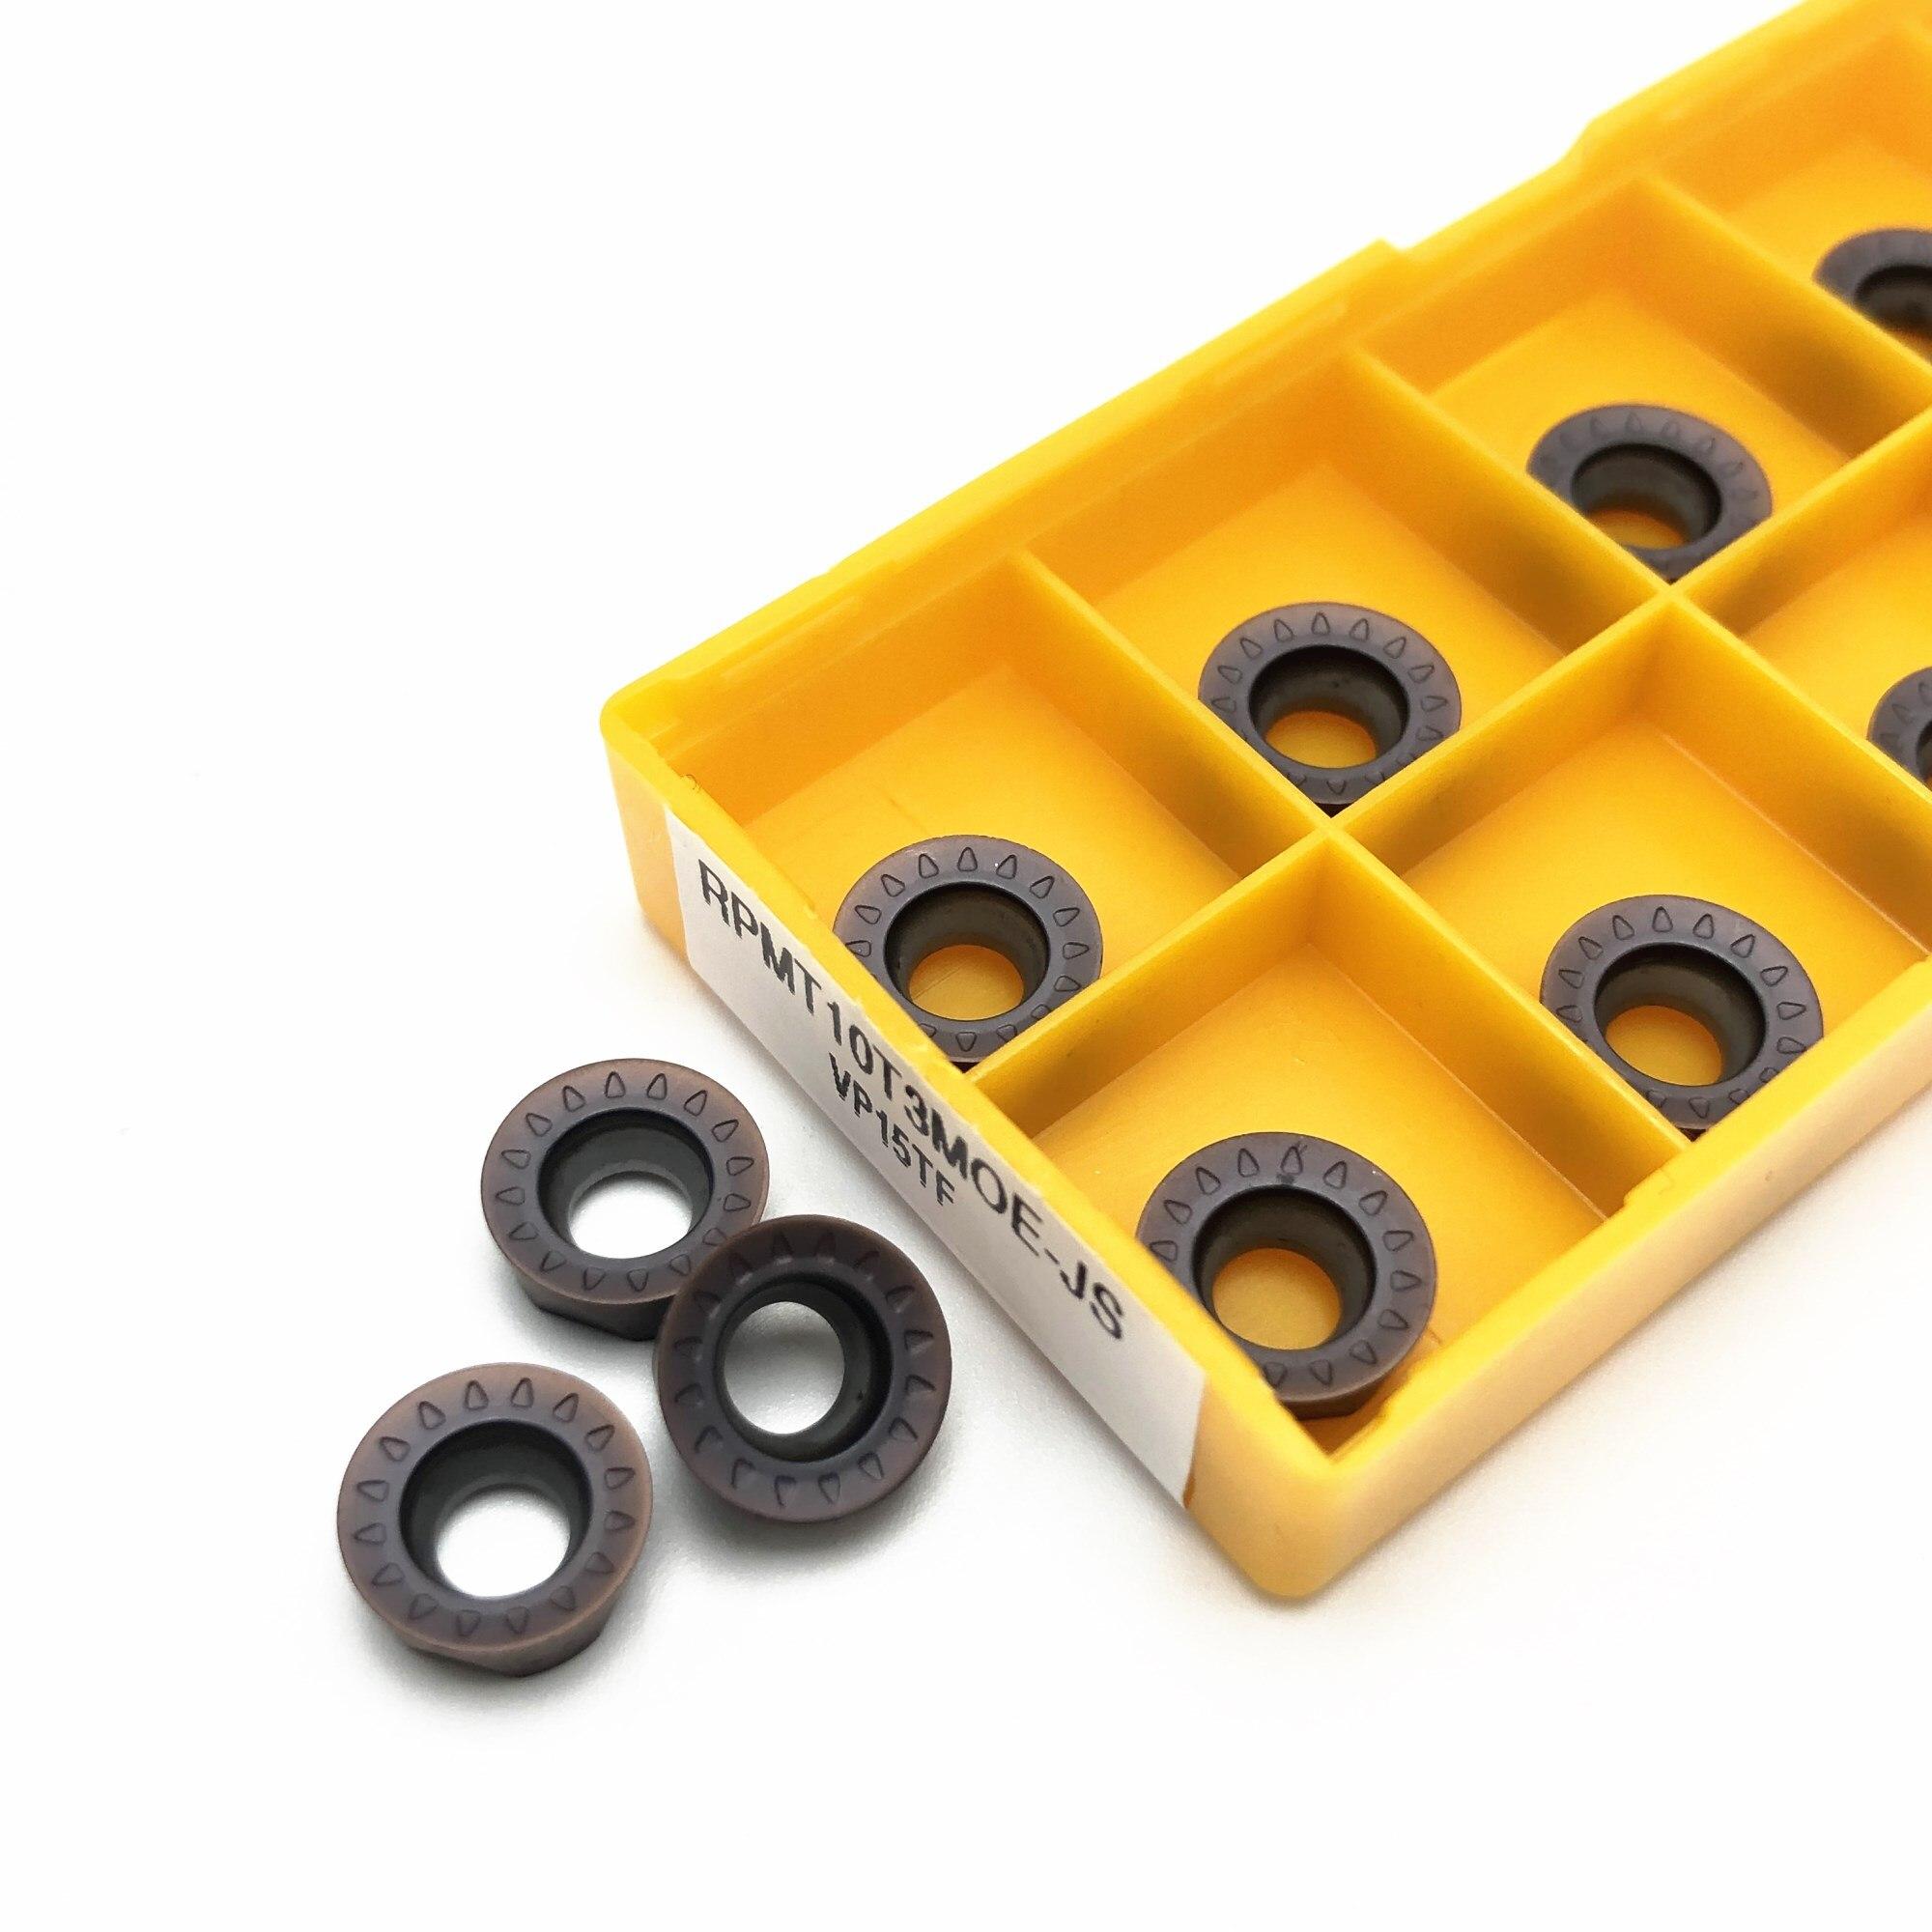 10PCS Lathe Tool RPMT10T3MOE JS VP15TF High Quality Internal Round Carbide Insert RPMT 10T3CNC Metal Turning Insert Milling Inse